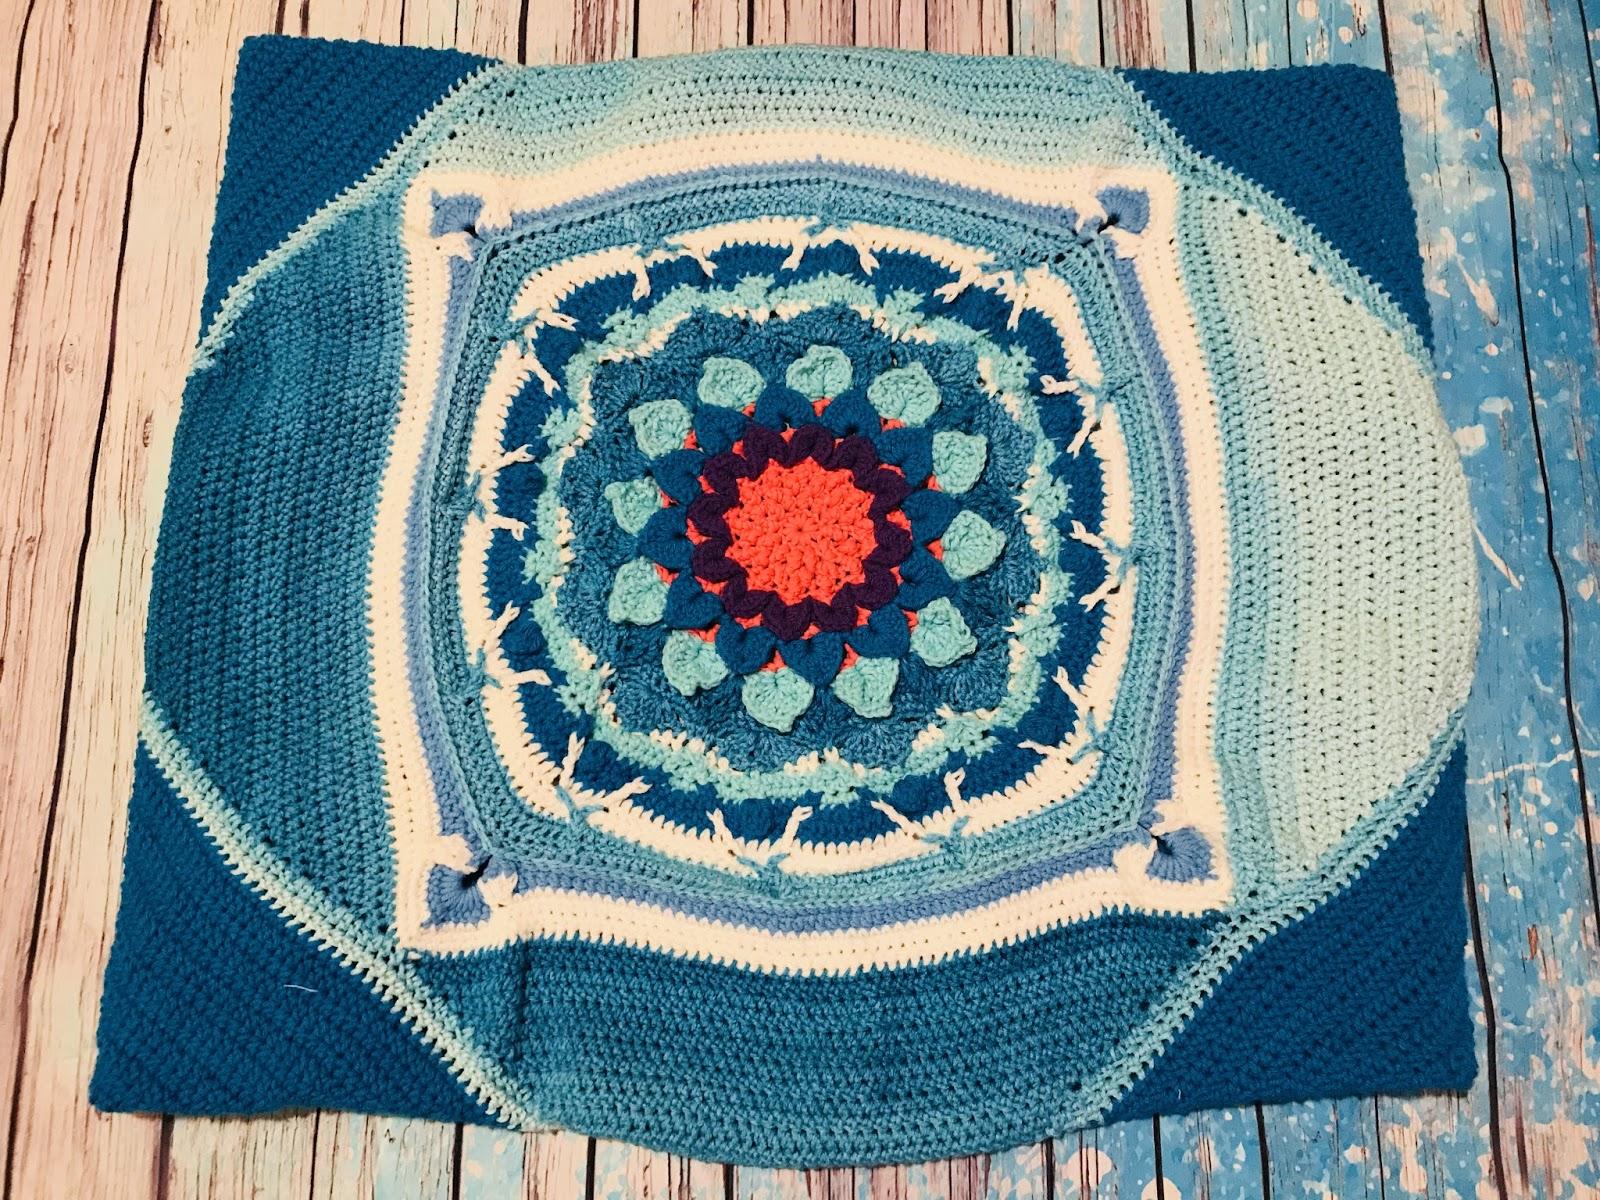 PinkOlay Crochet: Crocodile Flower kaleidoscope blank